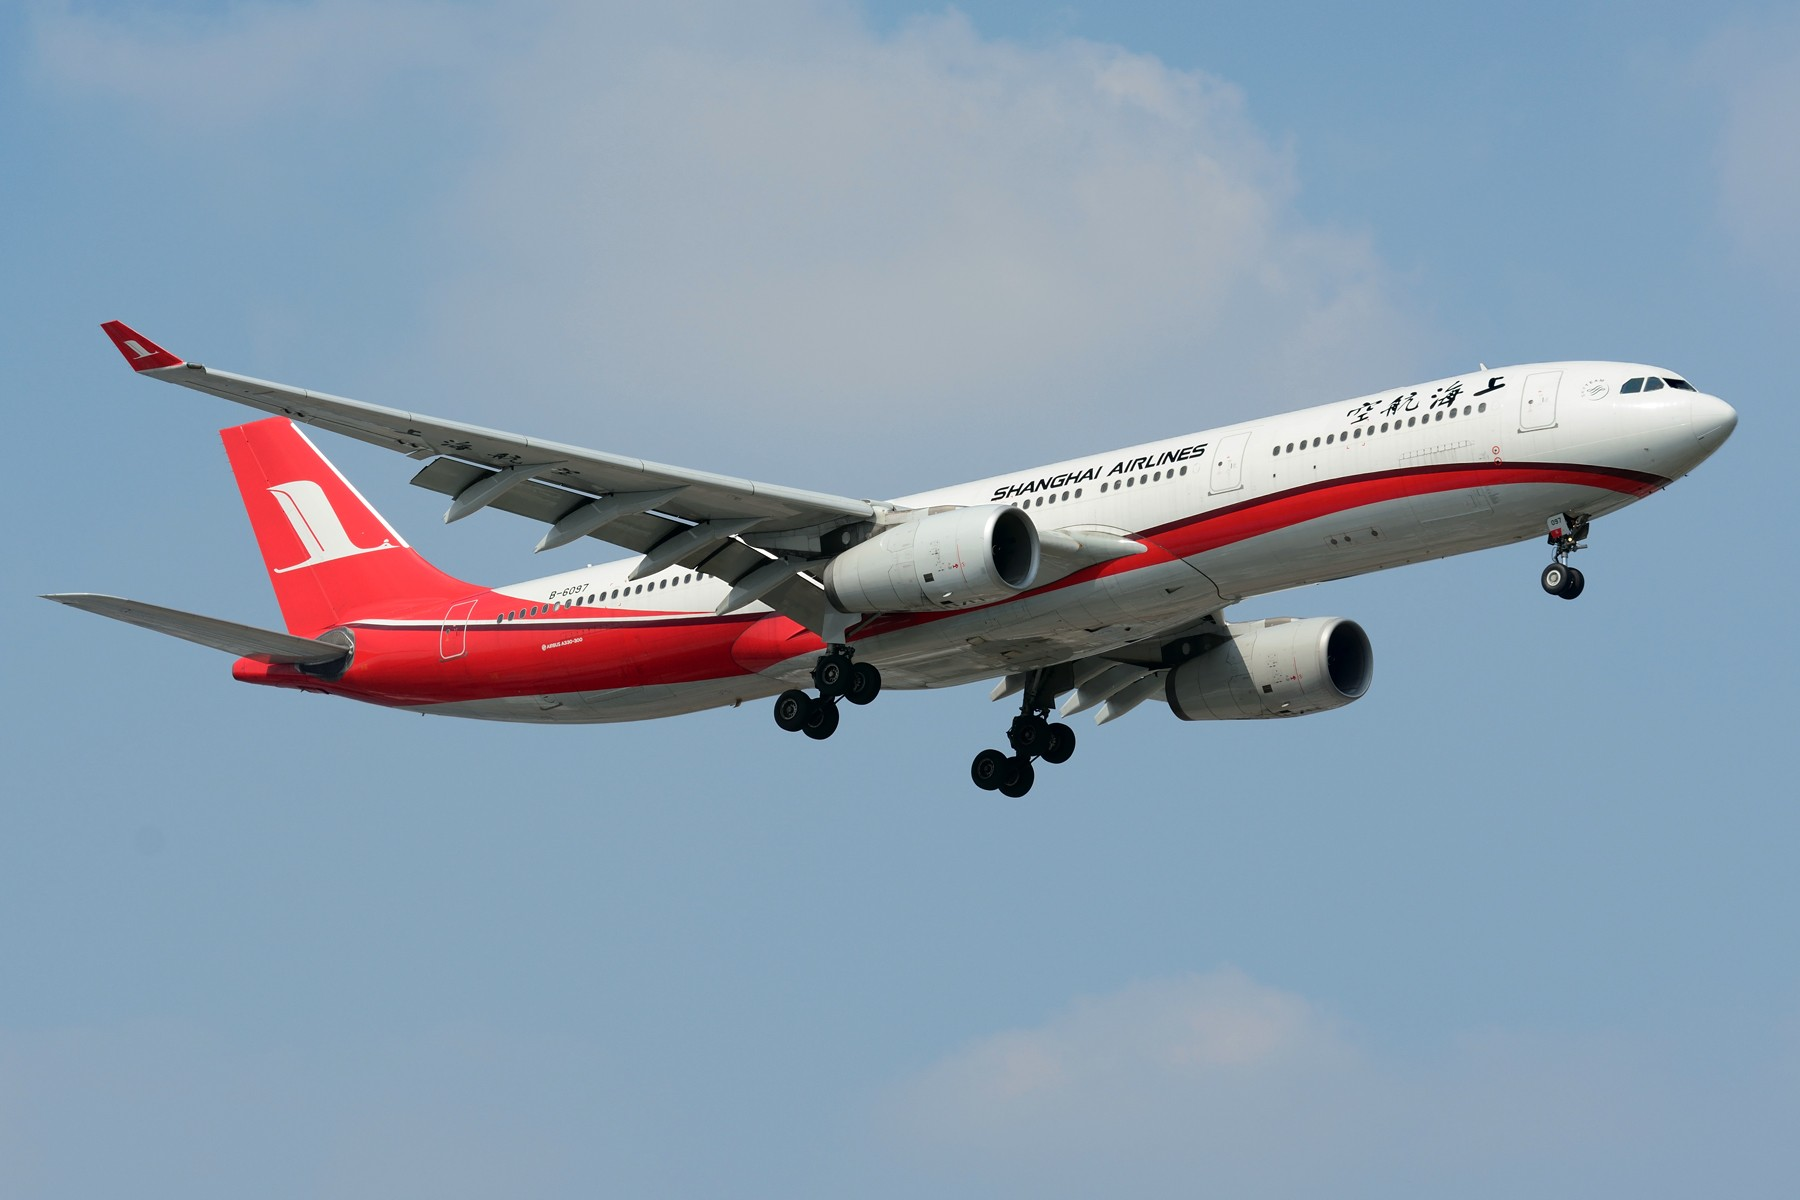 Re:[原创]【SHA】上海航空A330-300机队 B-6096 B-6097 B-6127 AIRBUS A330-300 B-6097 中国上海虹桥国际机场